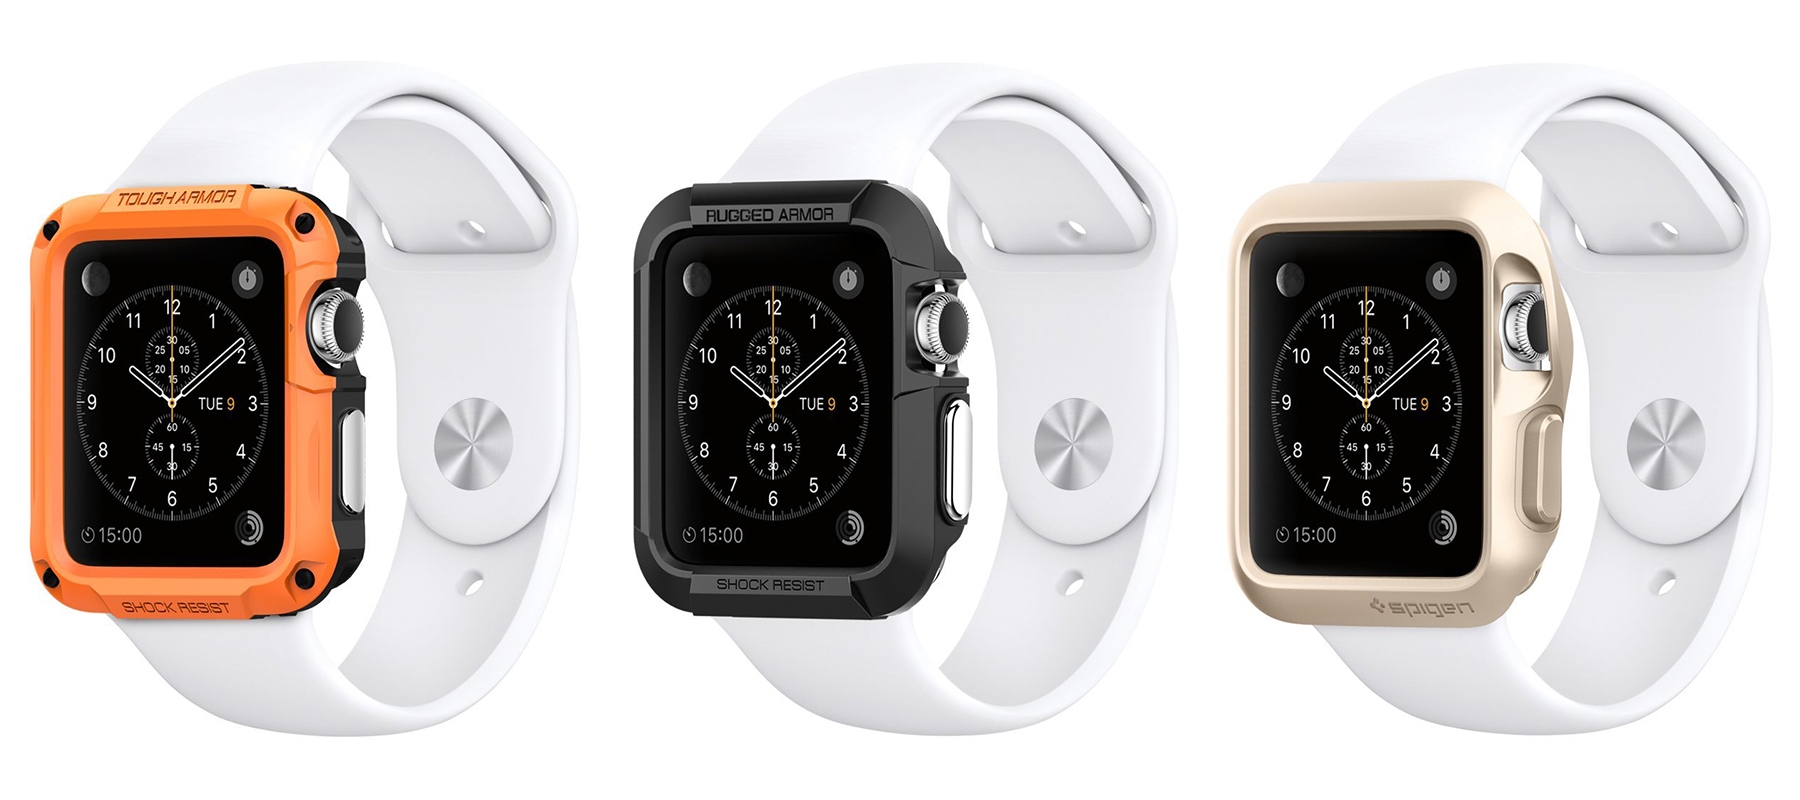 spigen-apple-watch-cases.jpg